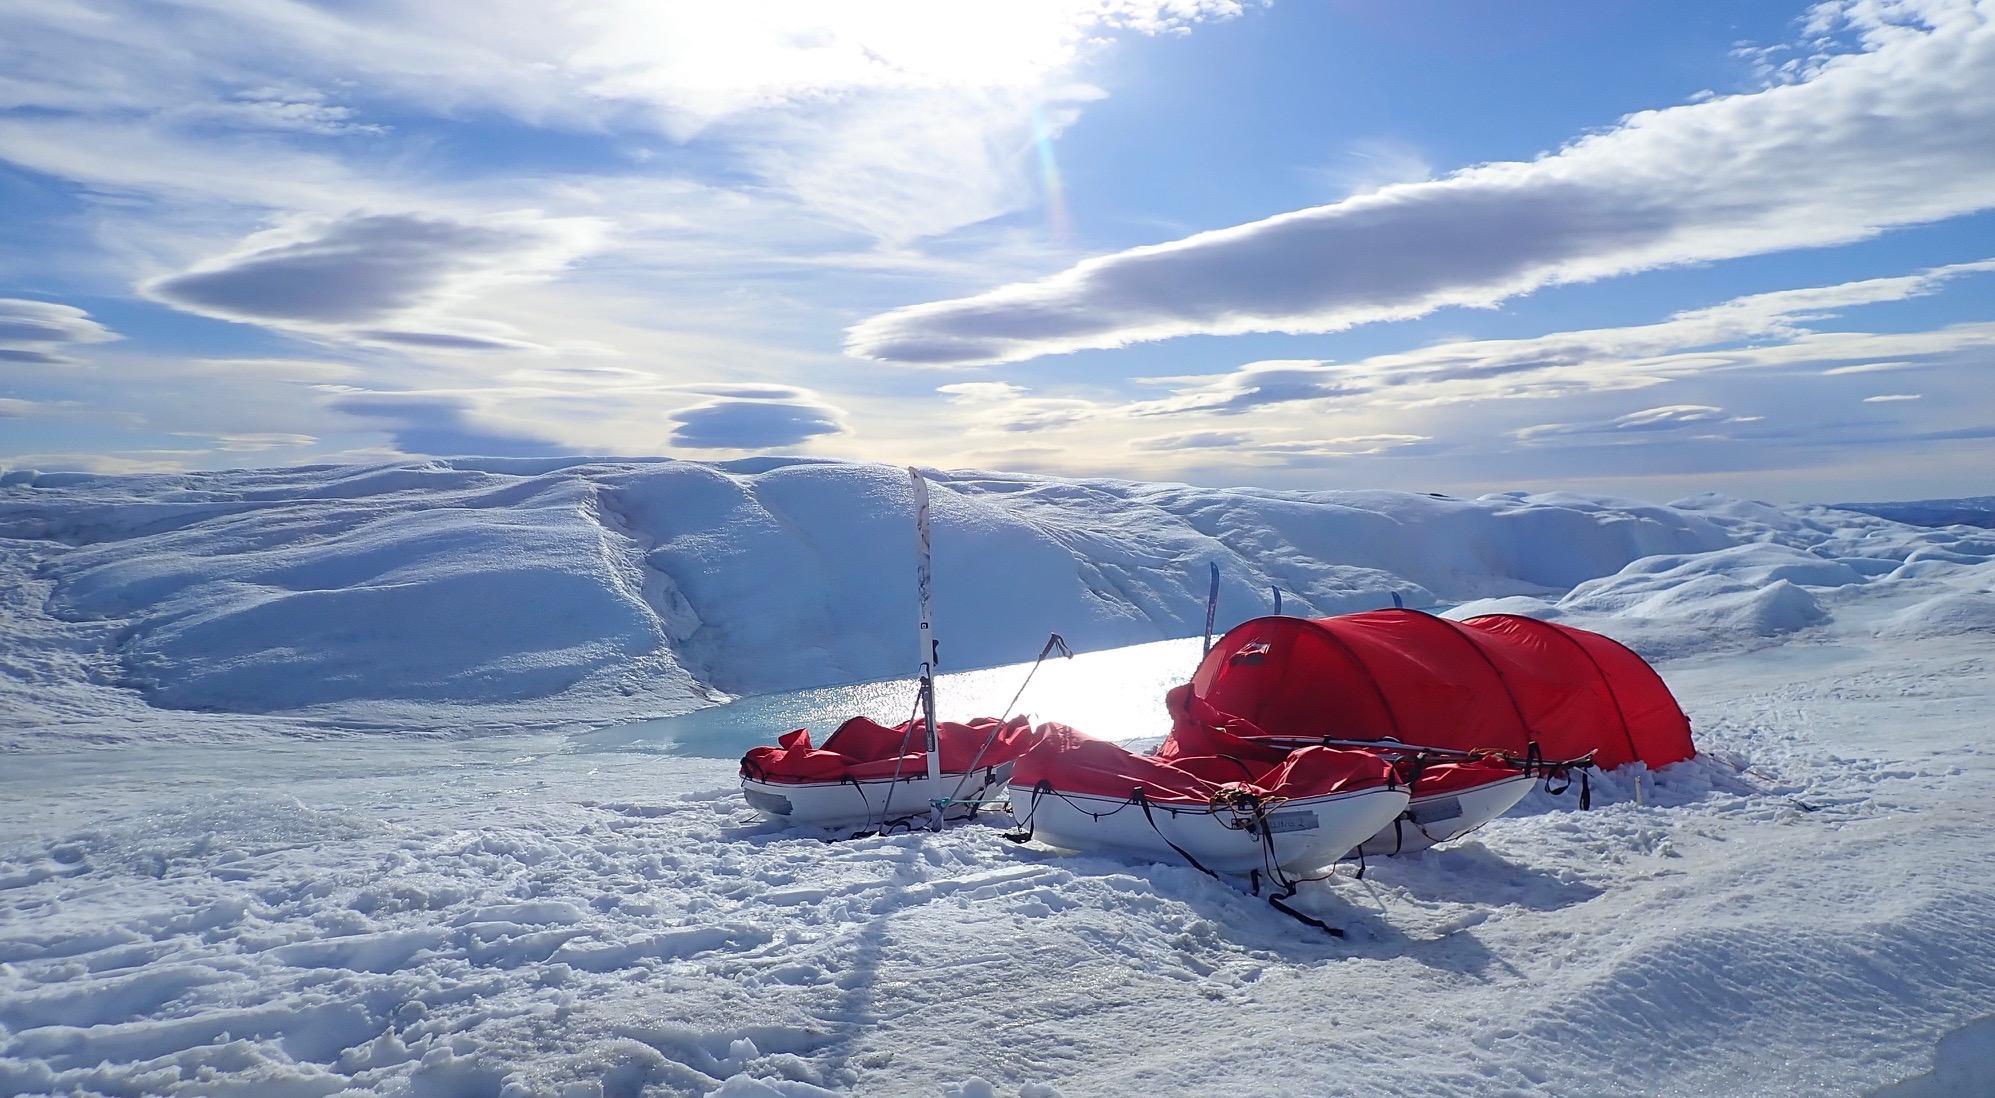 7 Summits / Skida över Grönland 600km